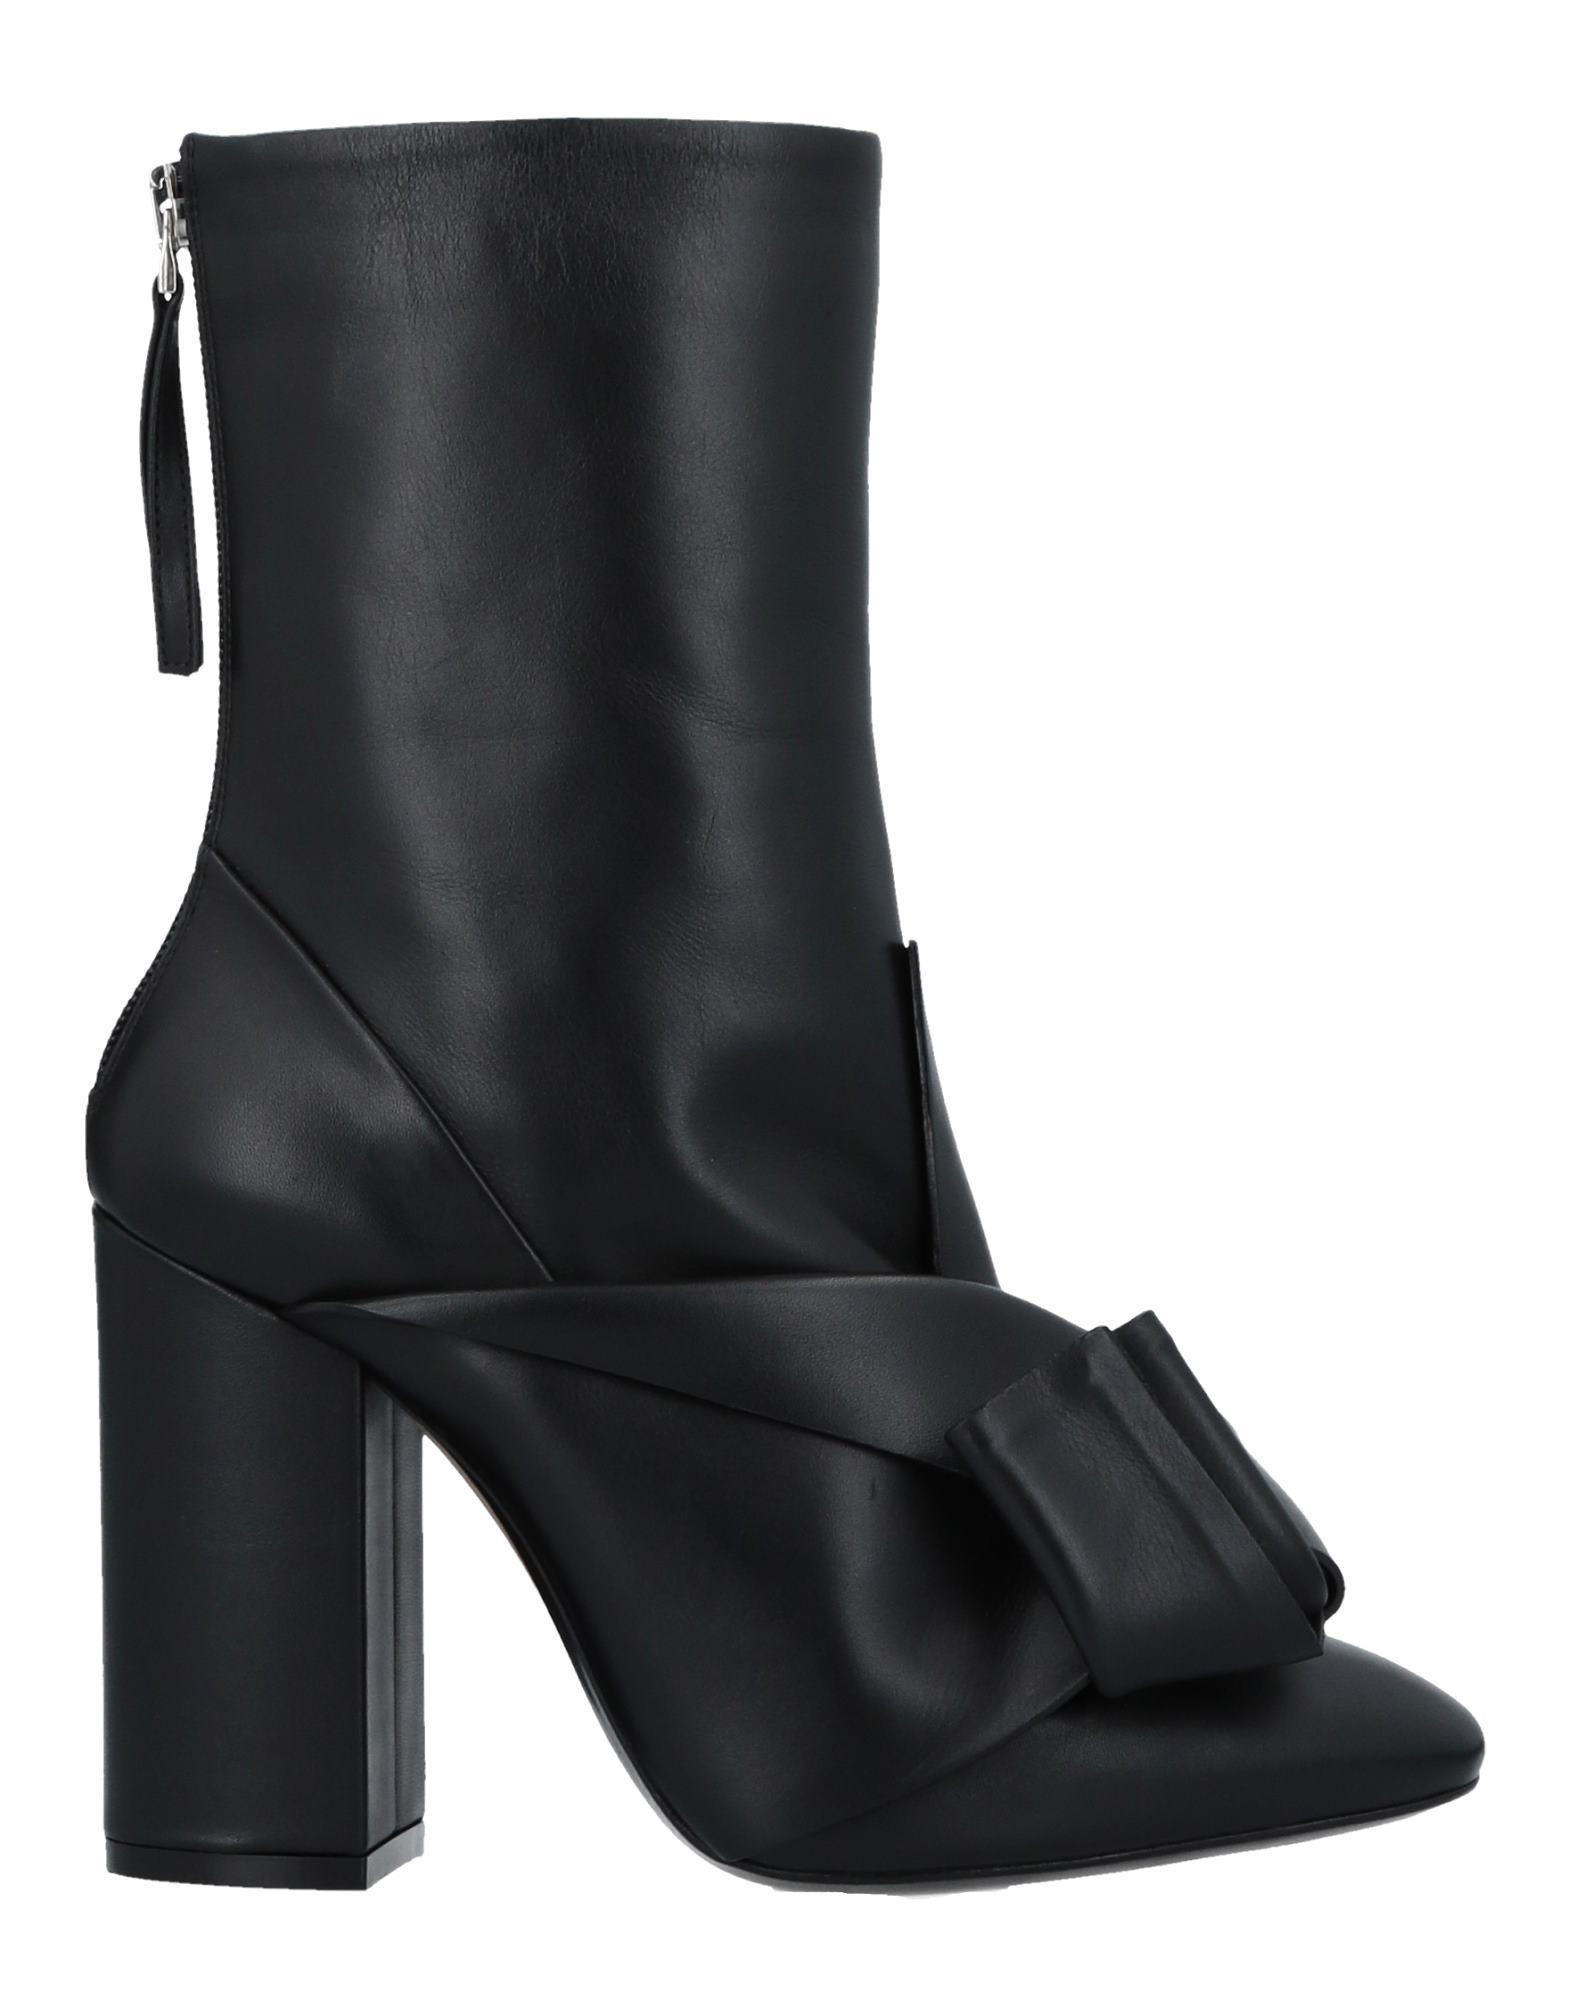 N° 11513160JM 21 Stiefelette Damen  11513160JM N° Neue Schuhe 95e182